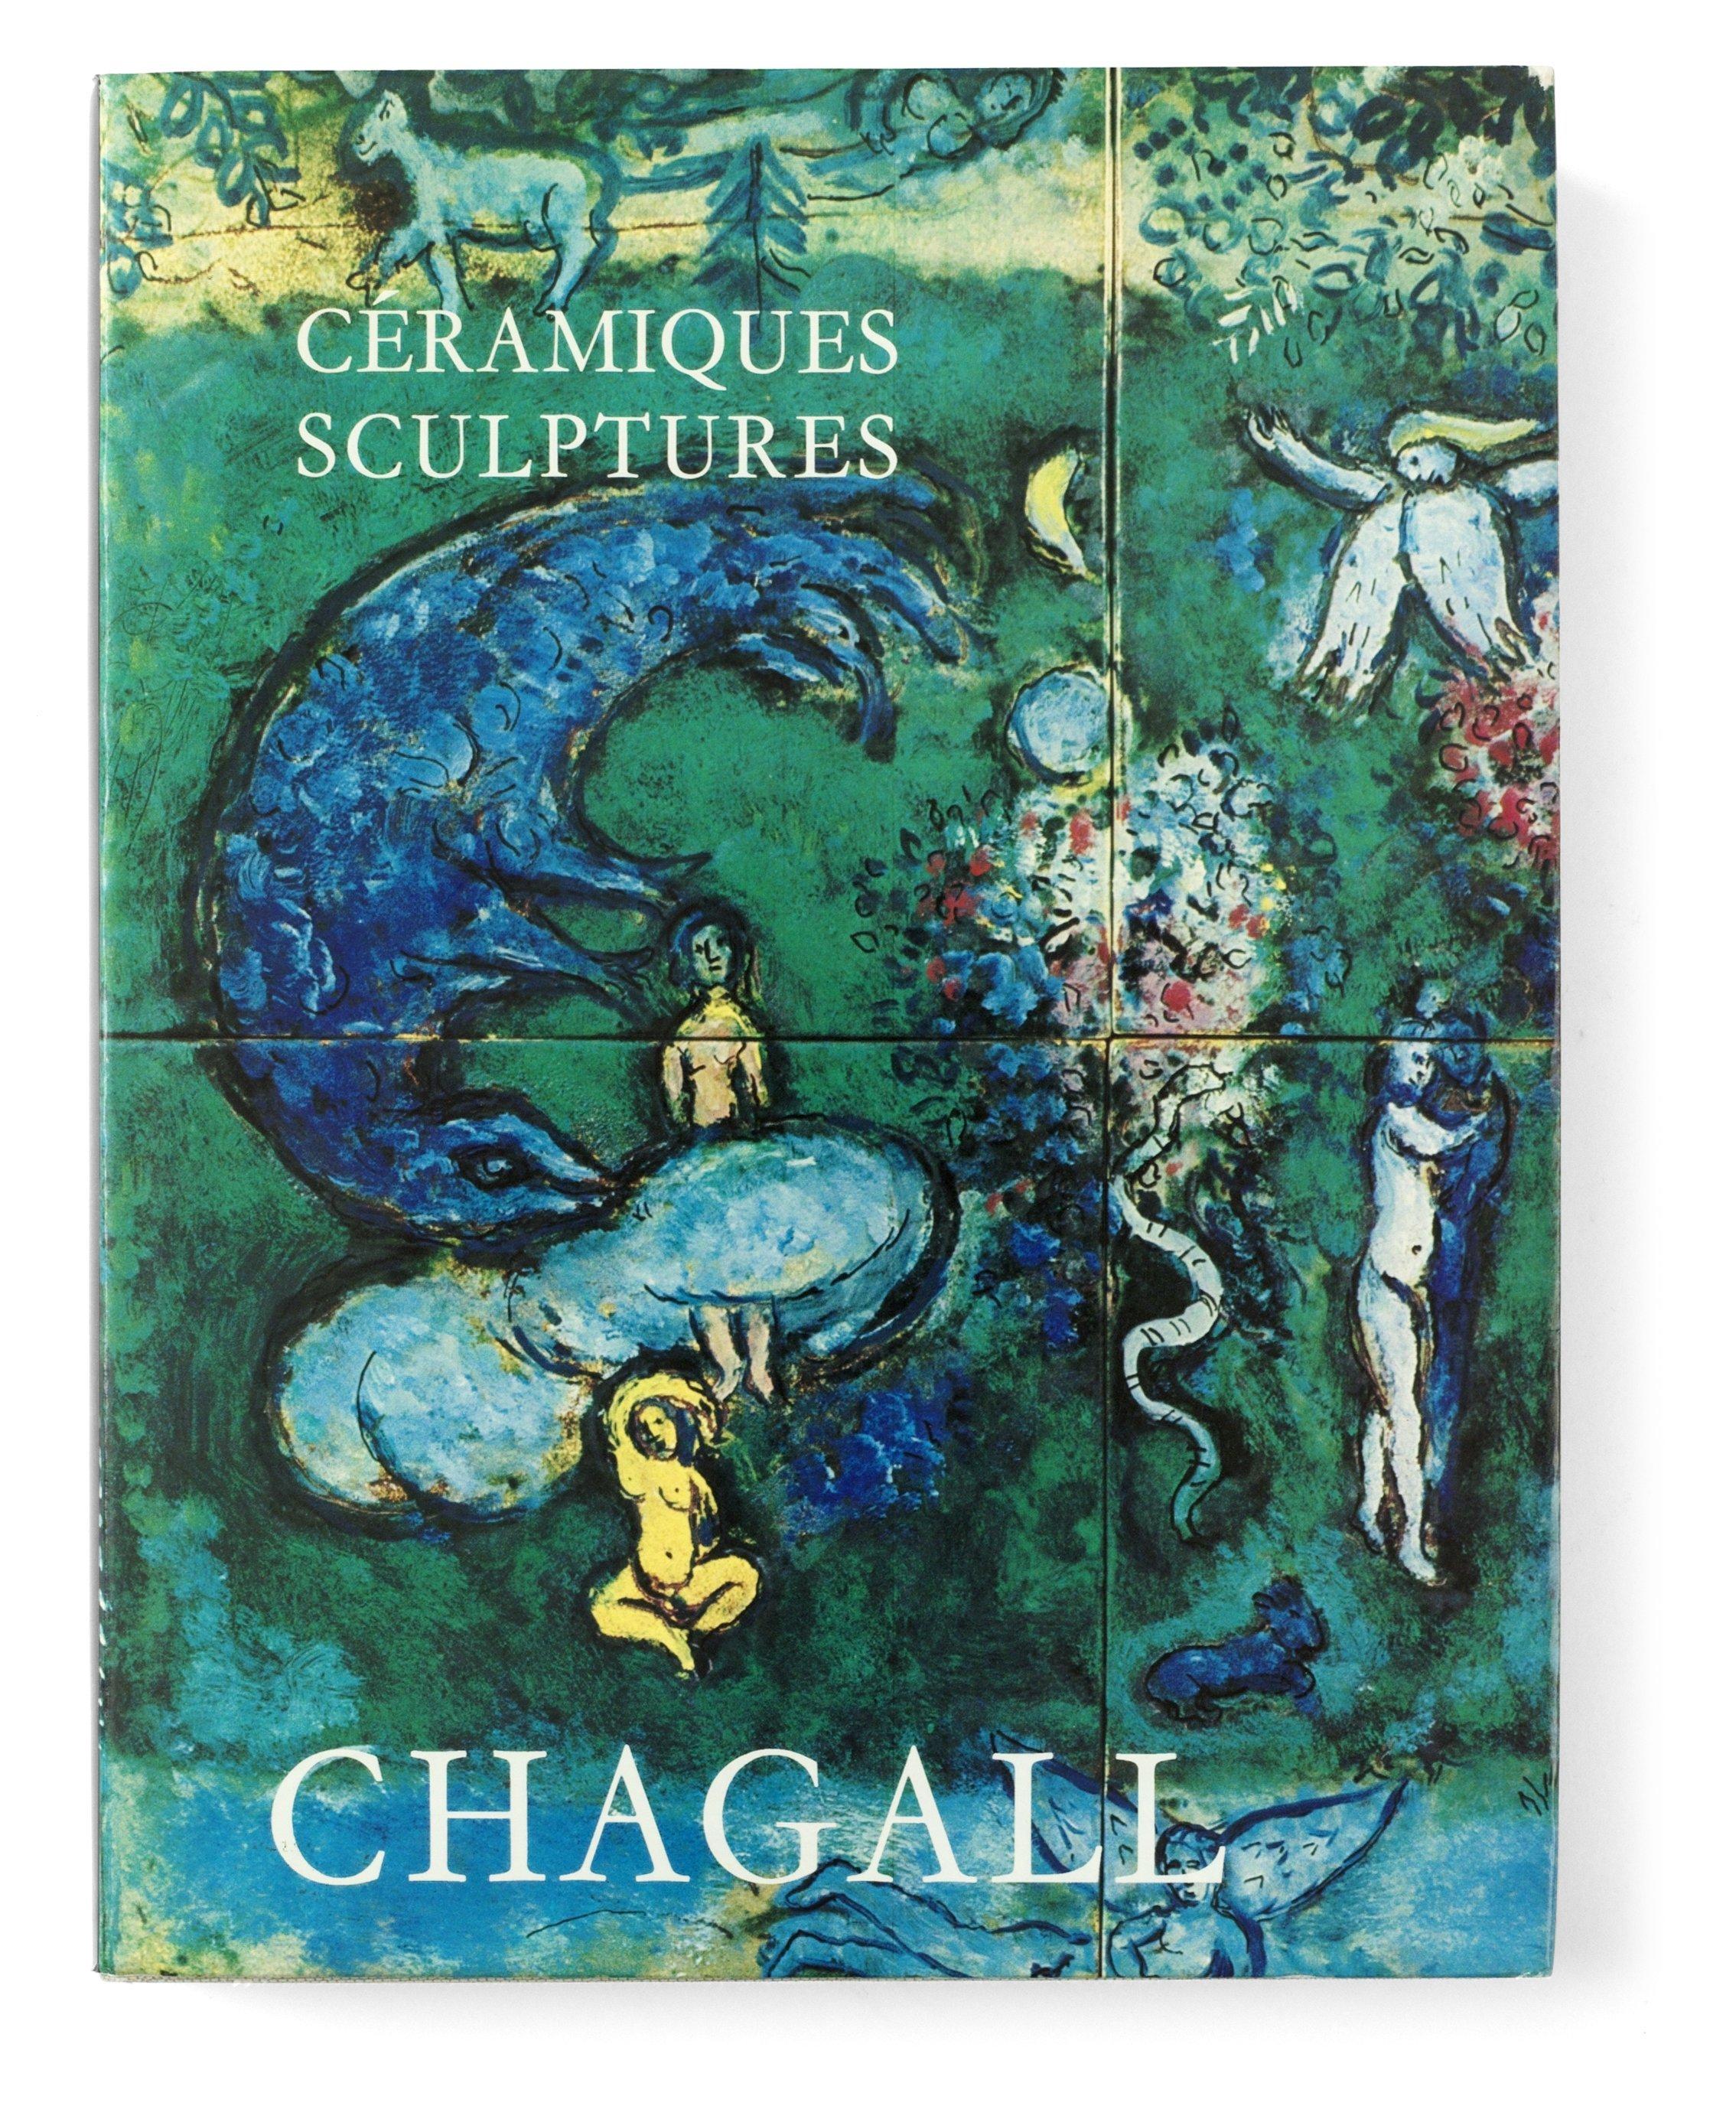 "MARC CHAGALL, ""Les Céramiques et Sculptures de Chagall"", Charles Sorlier."